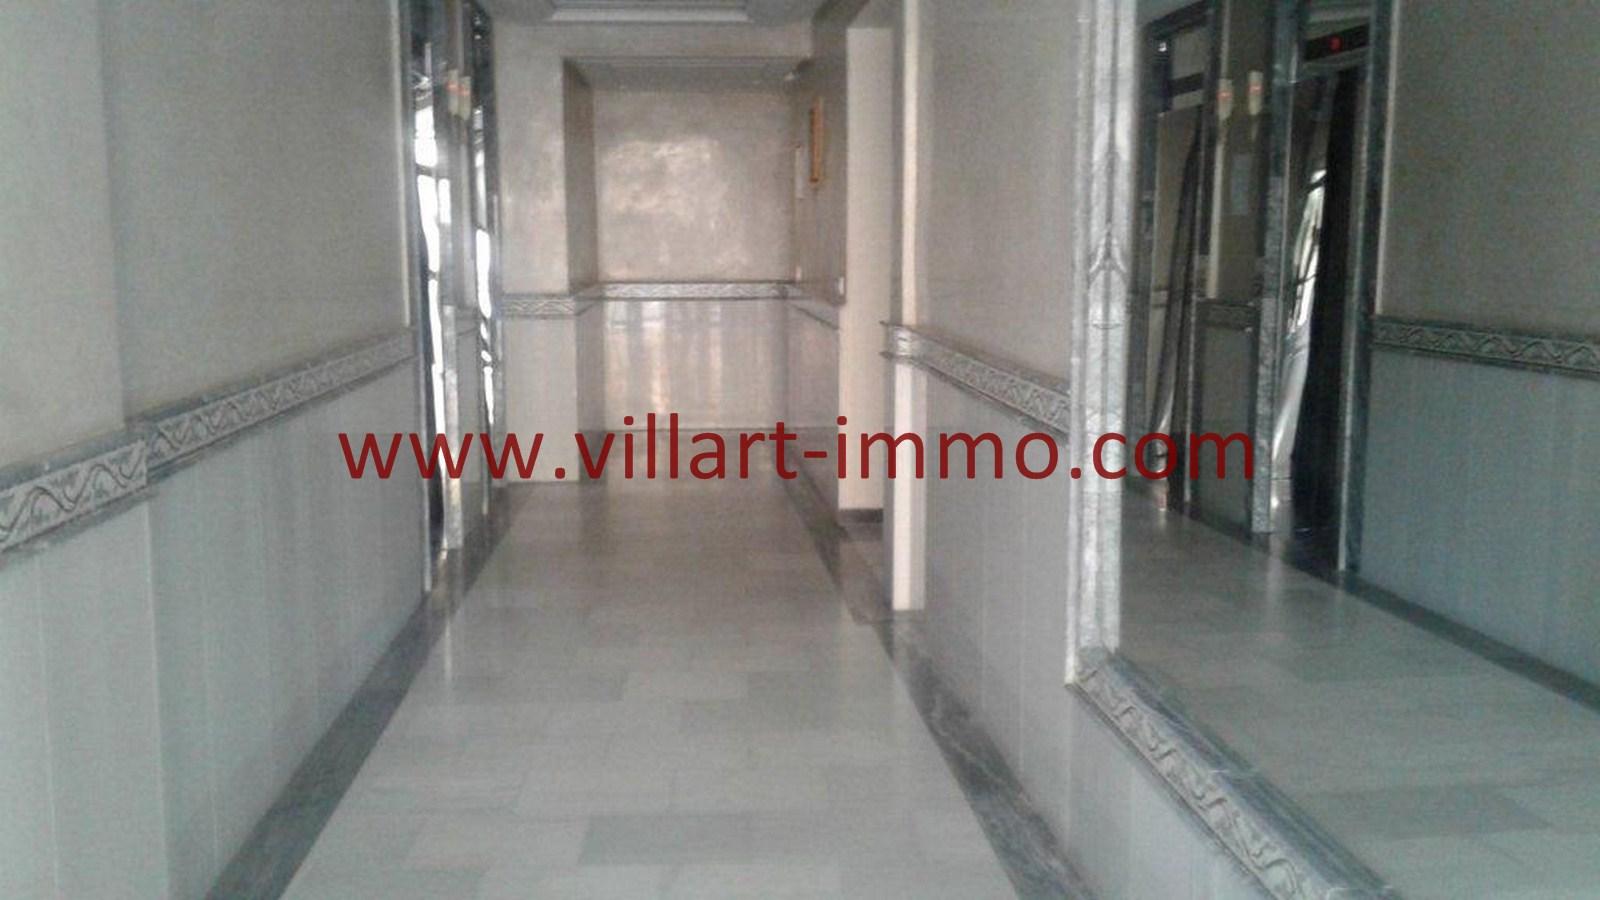 -A vendre-Appartement-Tanger-Castilla-Entrée-VA473-Villart immo-Agence Immobilière